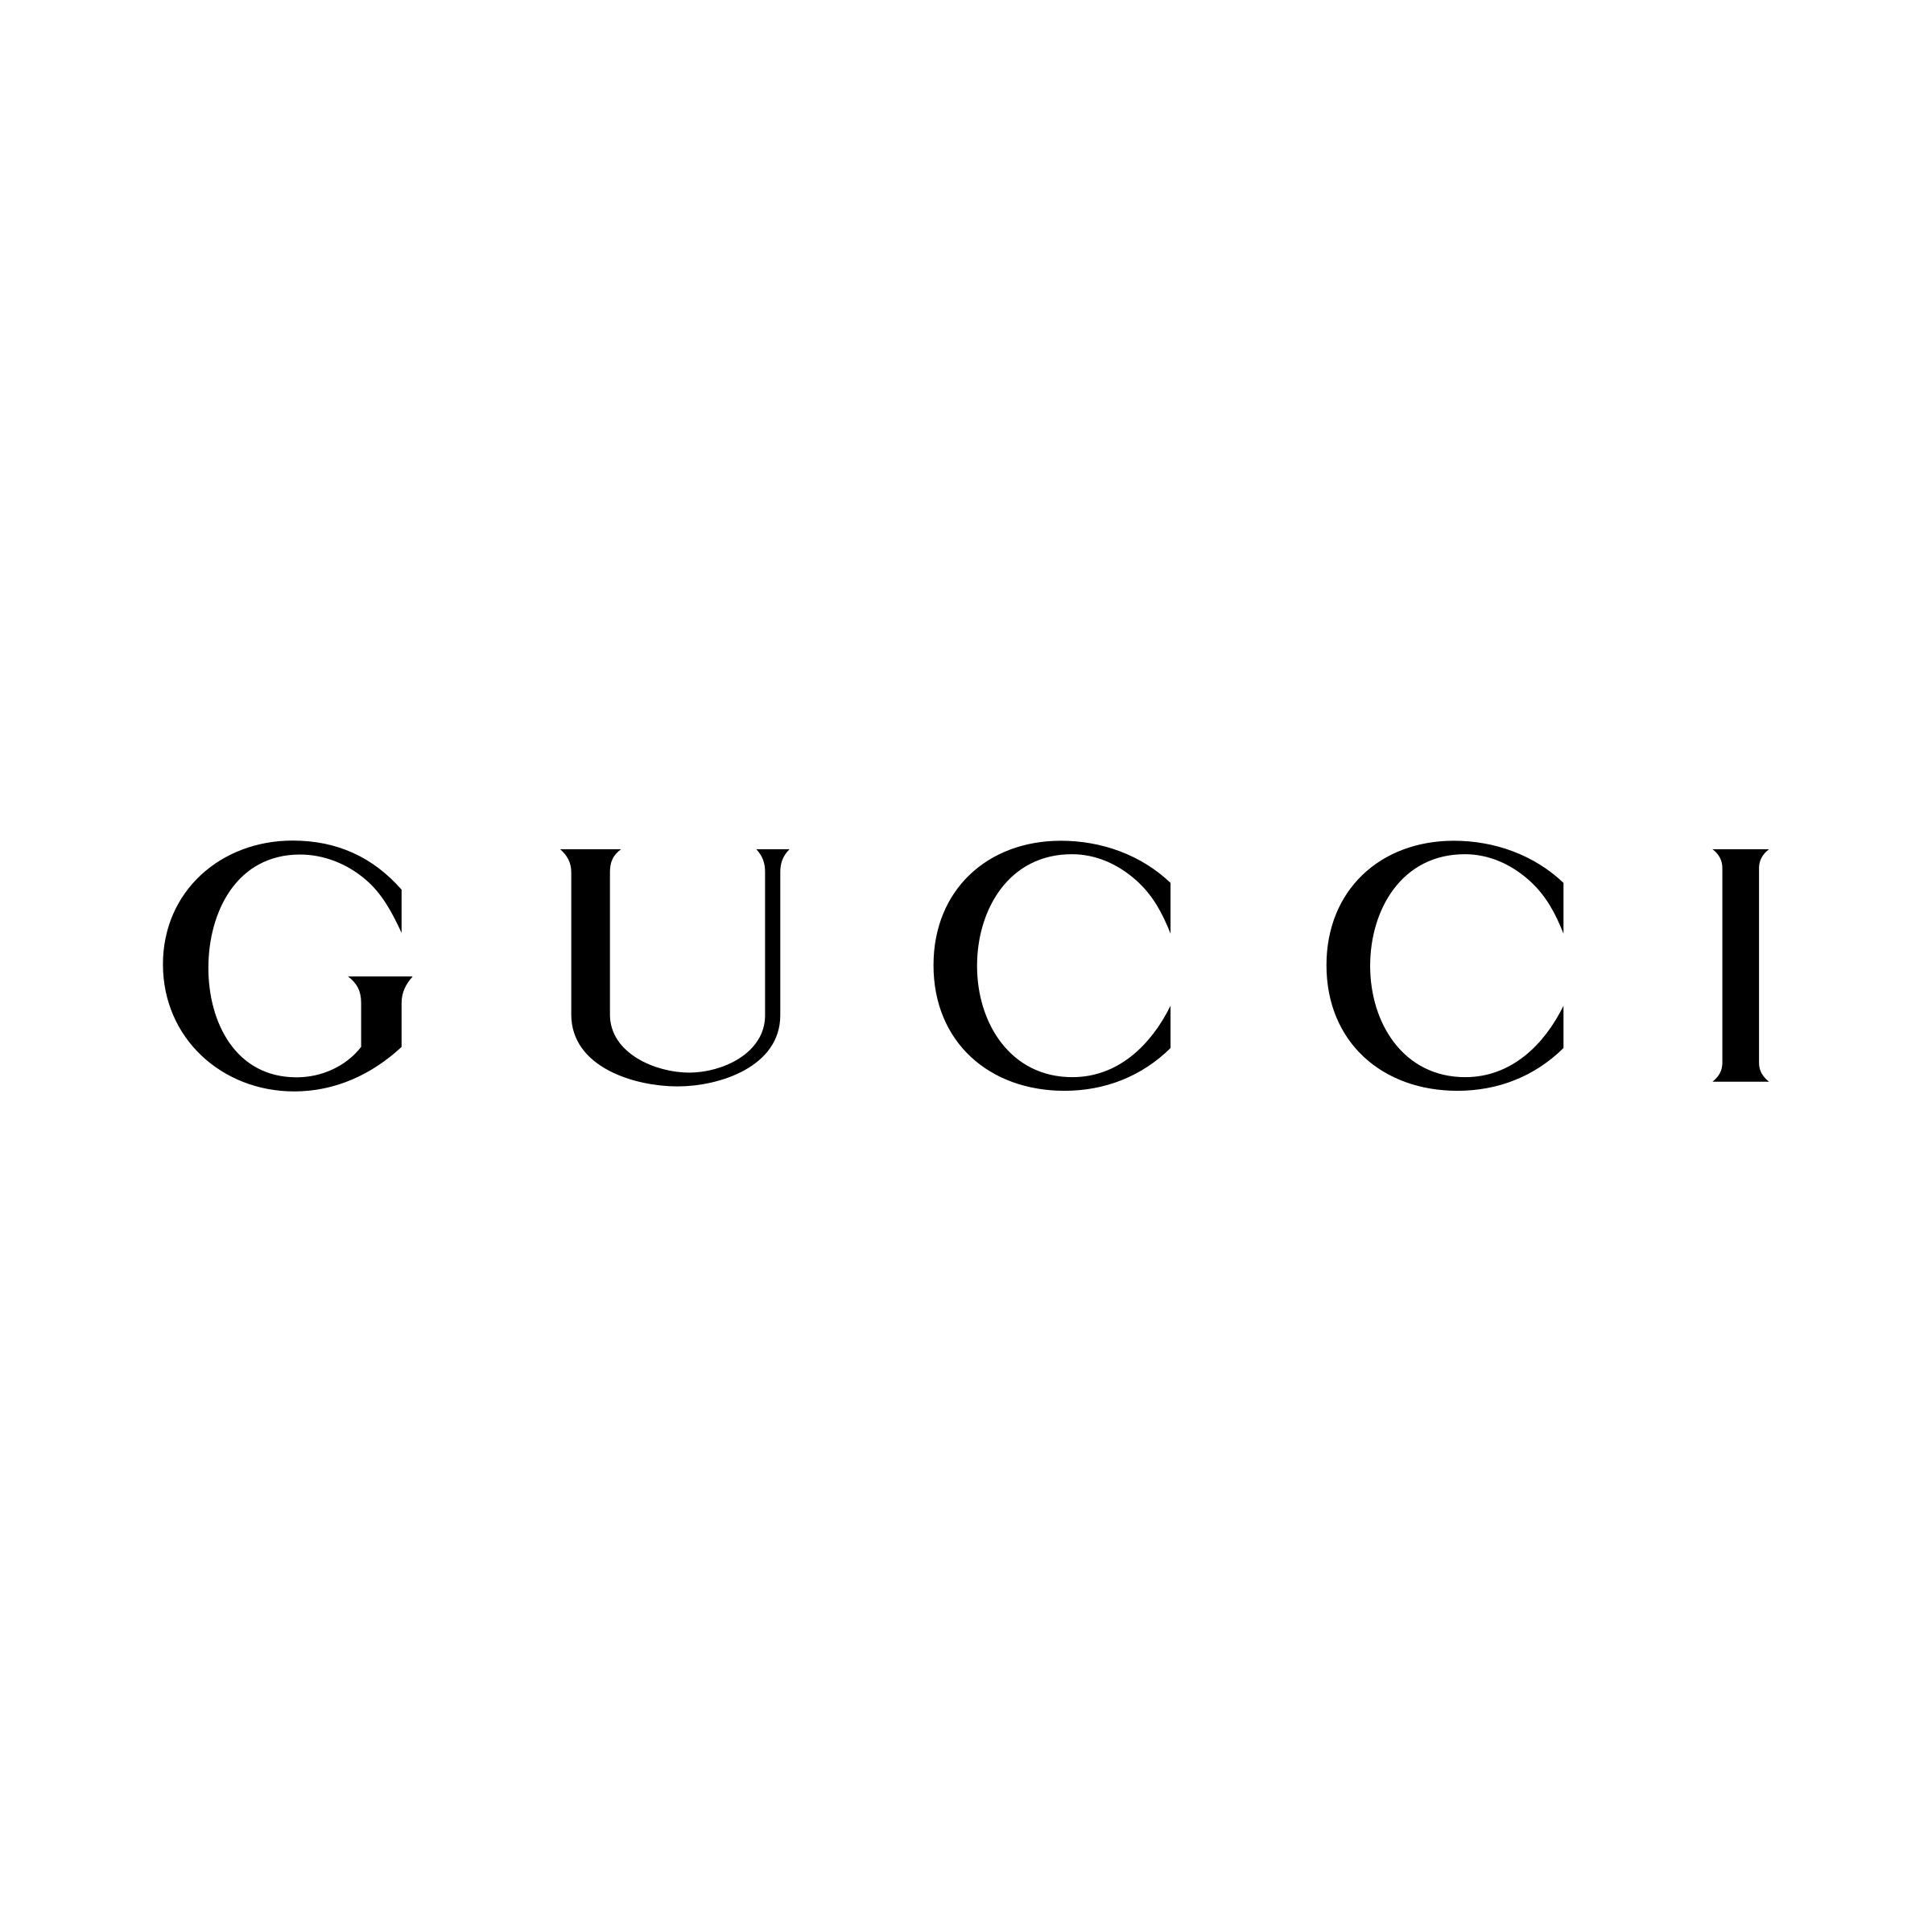 Gucci Logo PNG Transparent & SVG Vector - Freebie Supply